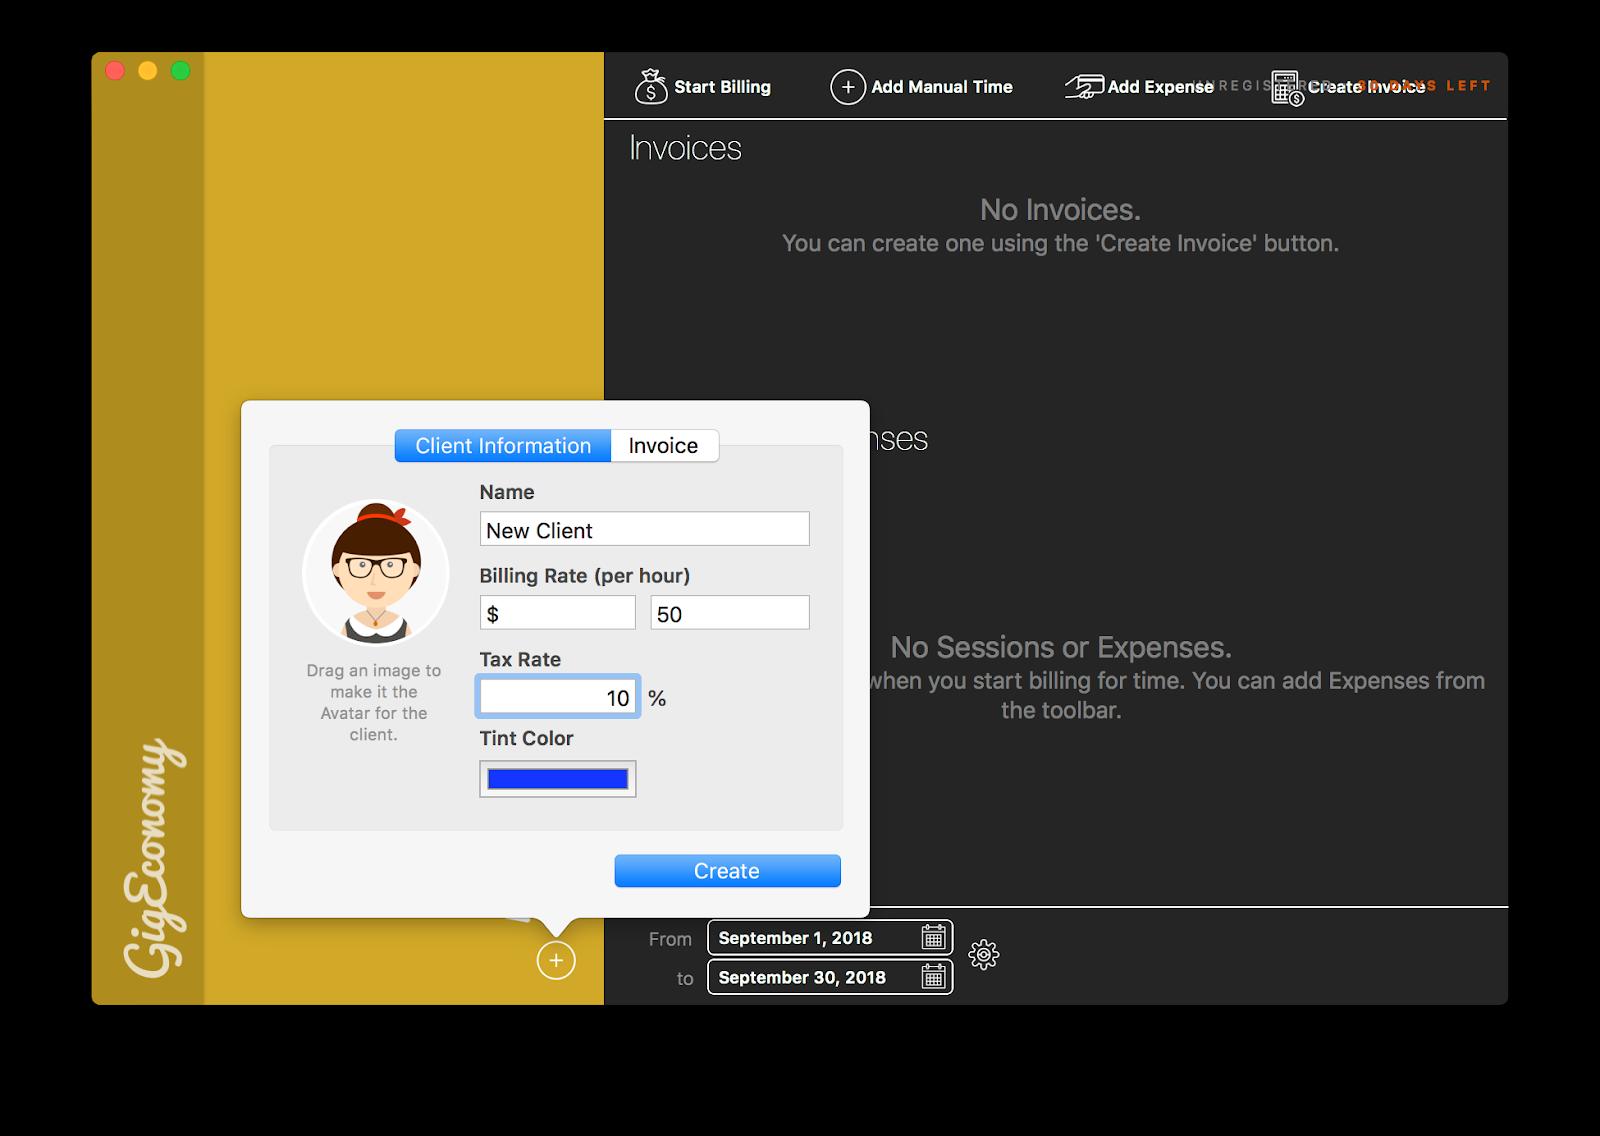 gigeconomy create a client